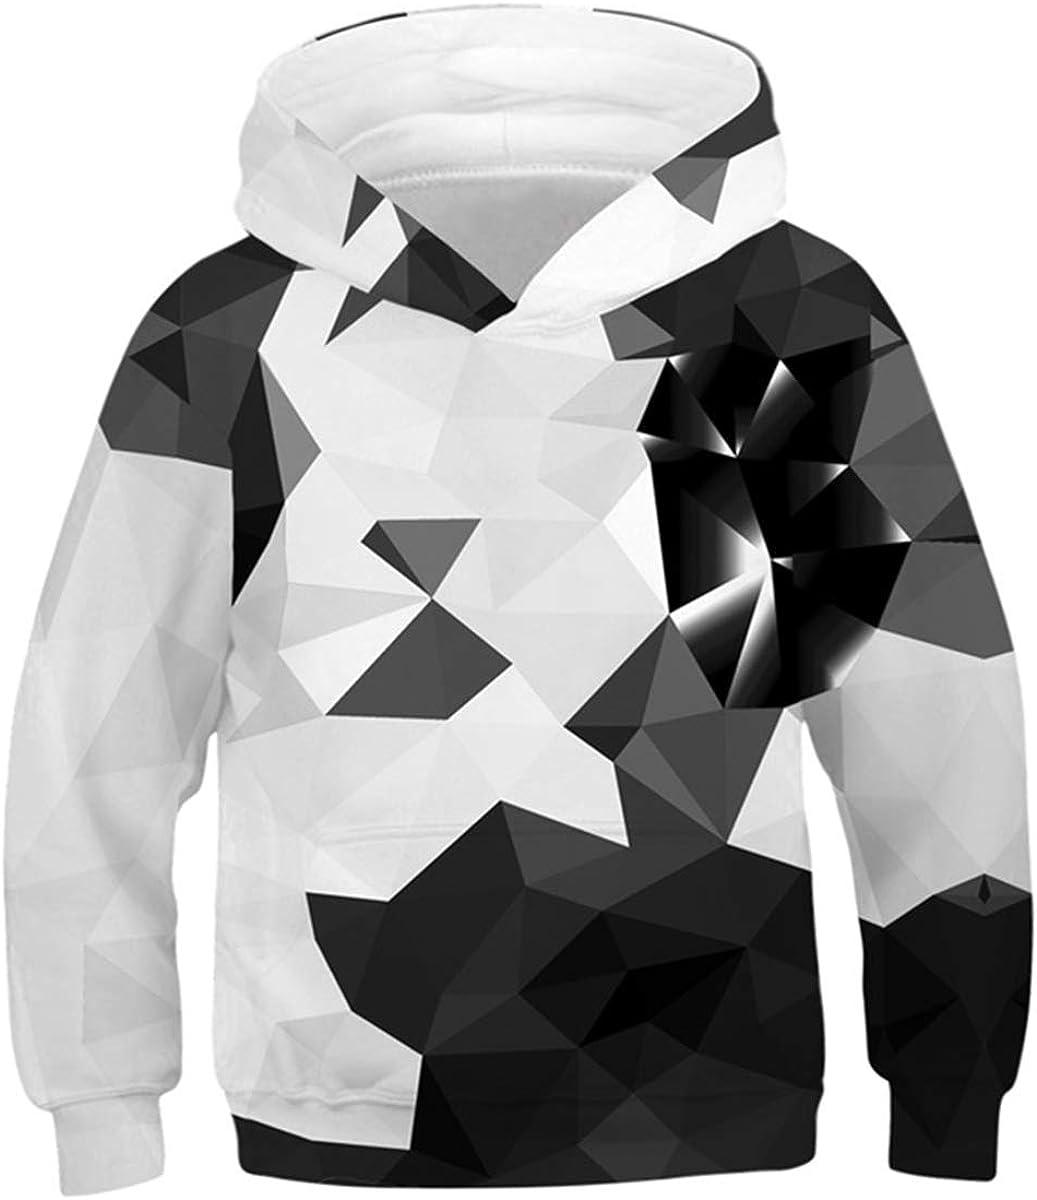 Lovekider Boys Girls Hoodies Sweatshirt Cool 3D Print Pullover with Big Pocket for Kids Fashion Warm Winter 6-16 Years: Clothing